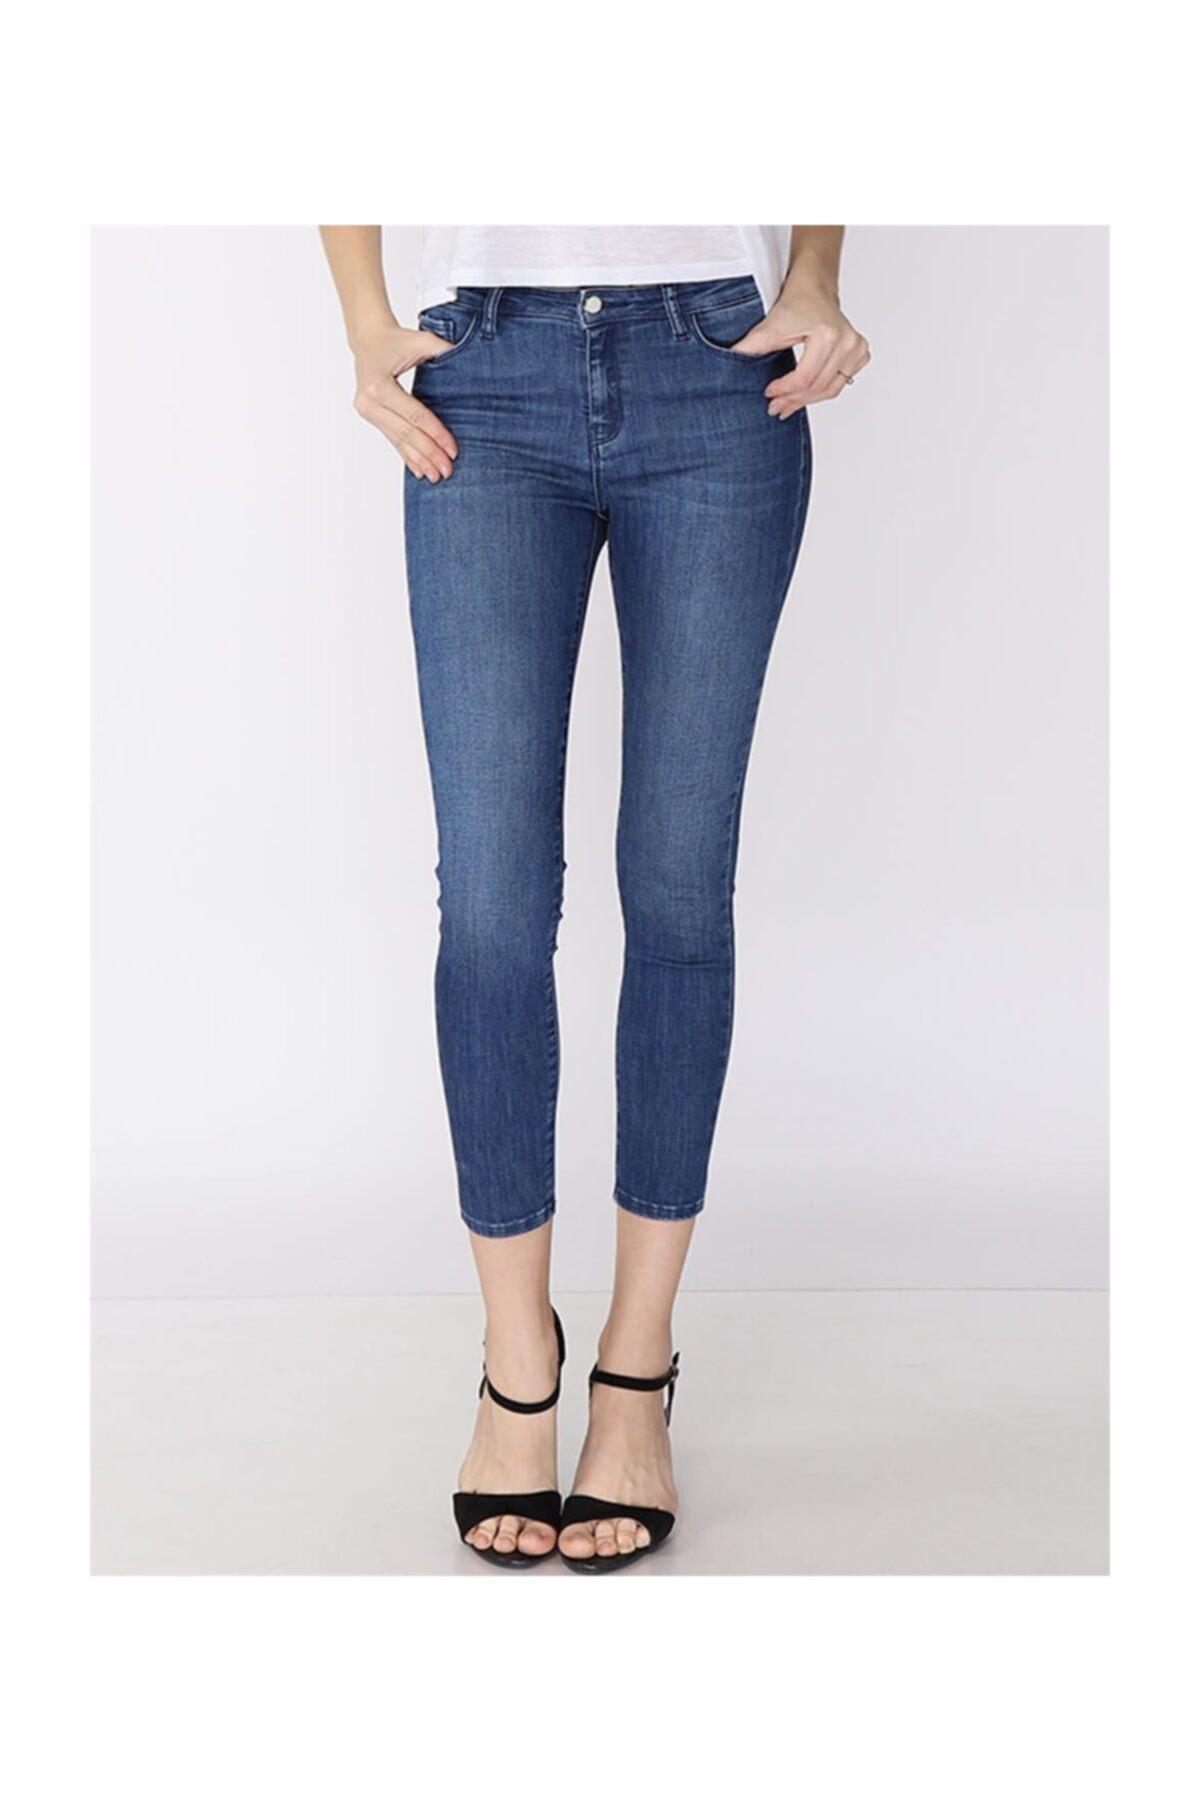 Twister Jeans Mındy Kadın Mavi Jean 1